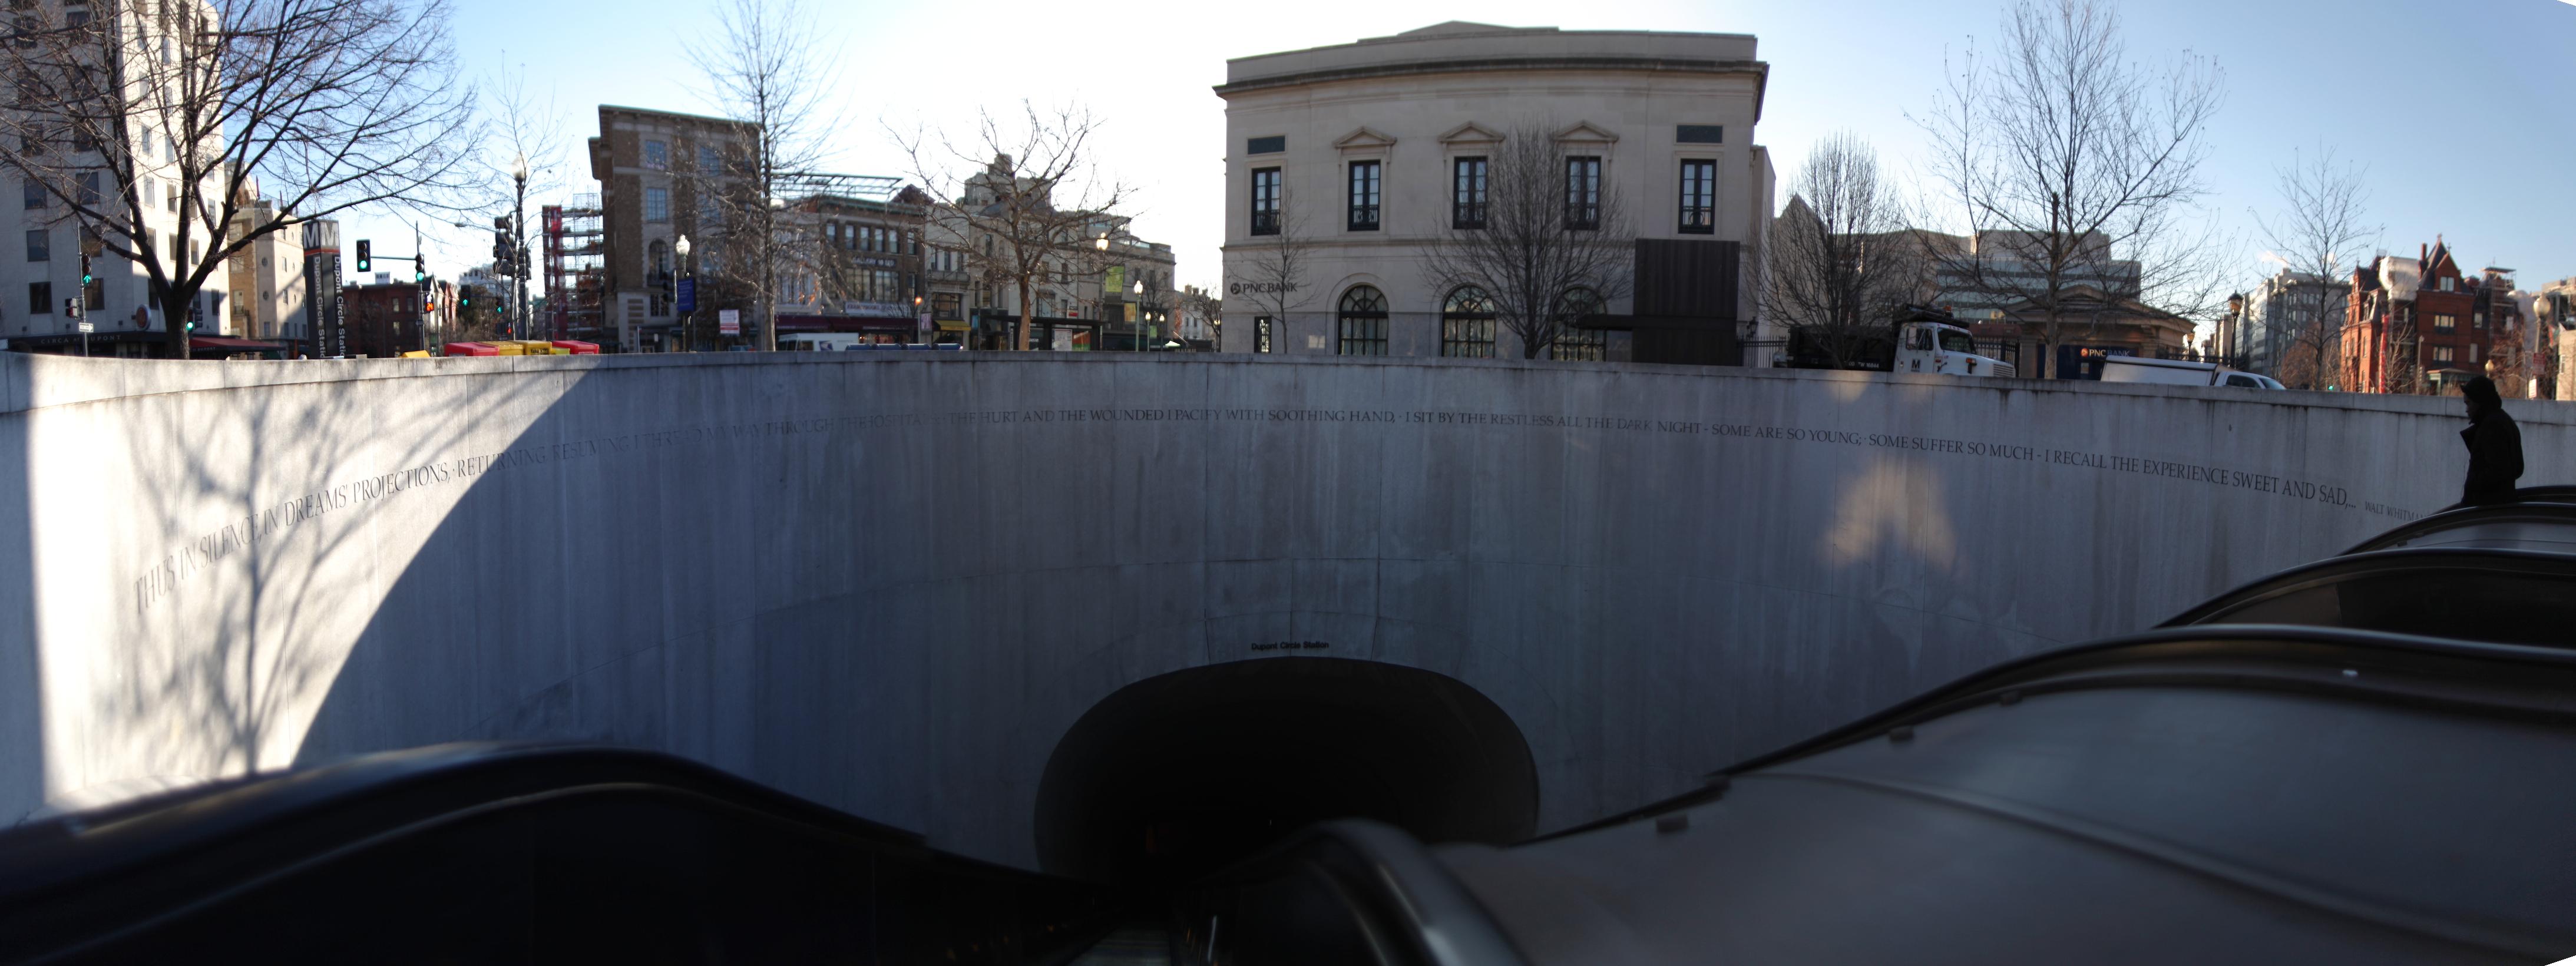 Dupont_Circle_Metro_-_north_exit.jpg